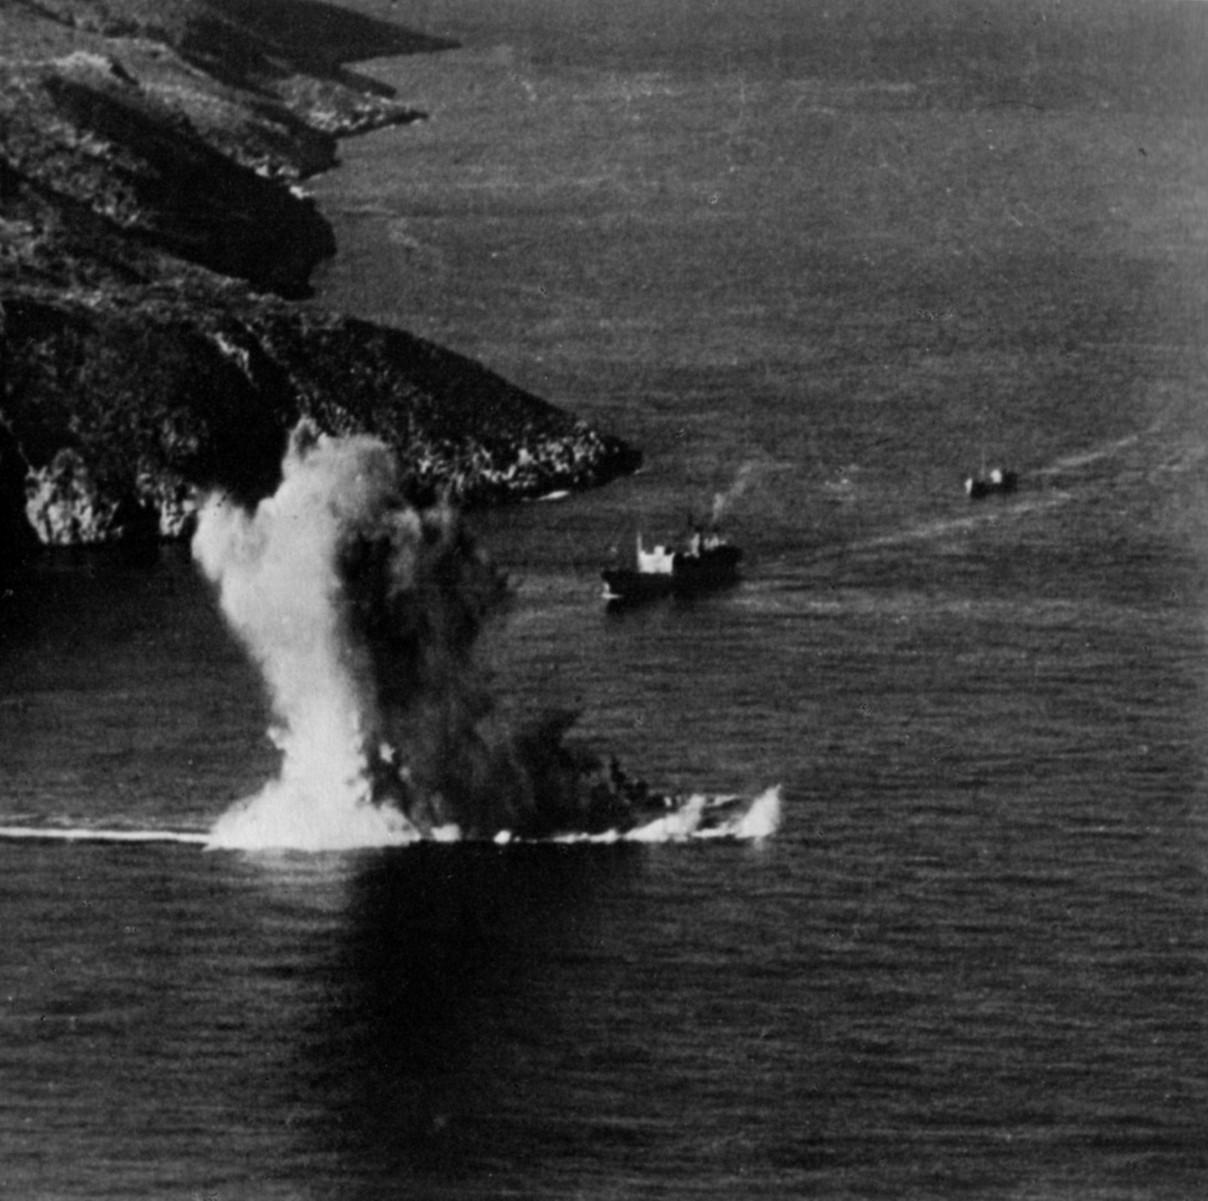 Alcione torpedoed by Truant off Crete 11.12.41.JPG